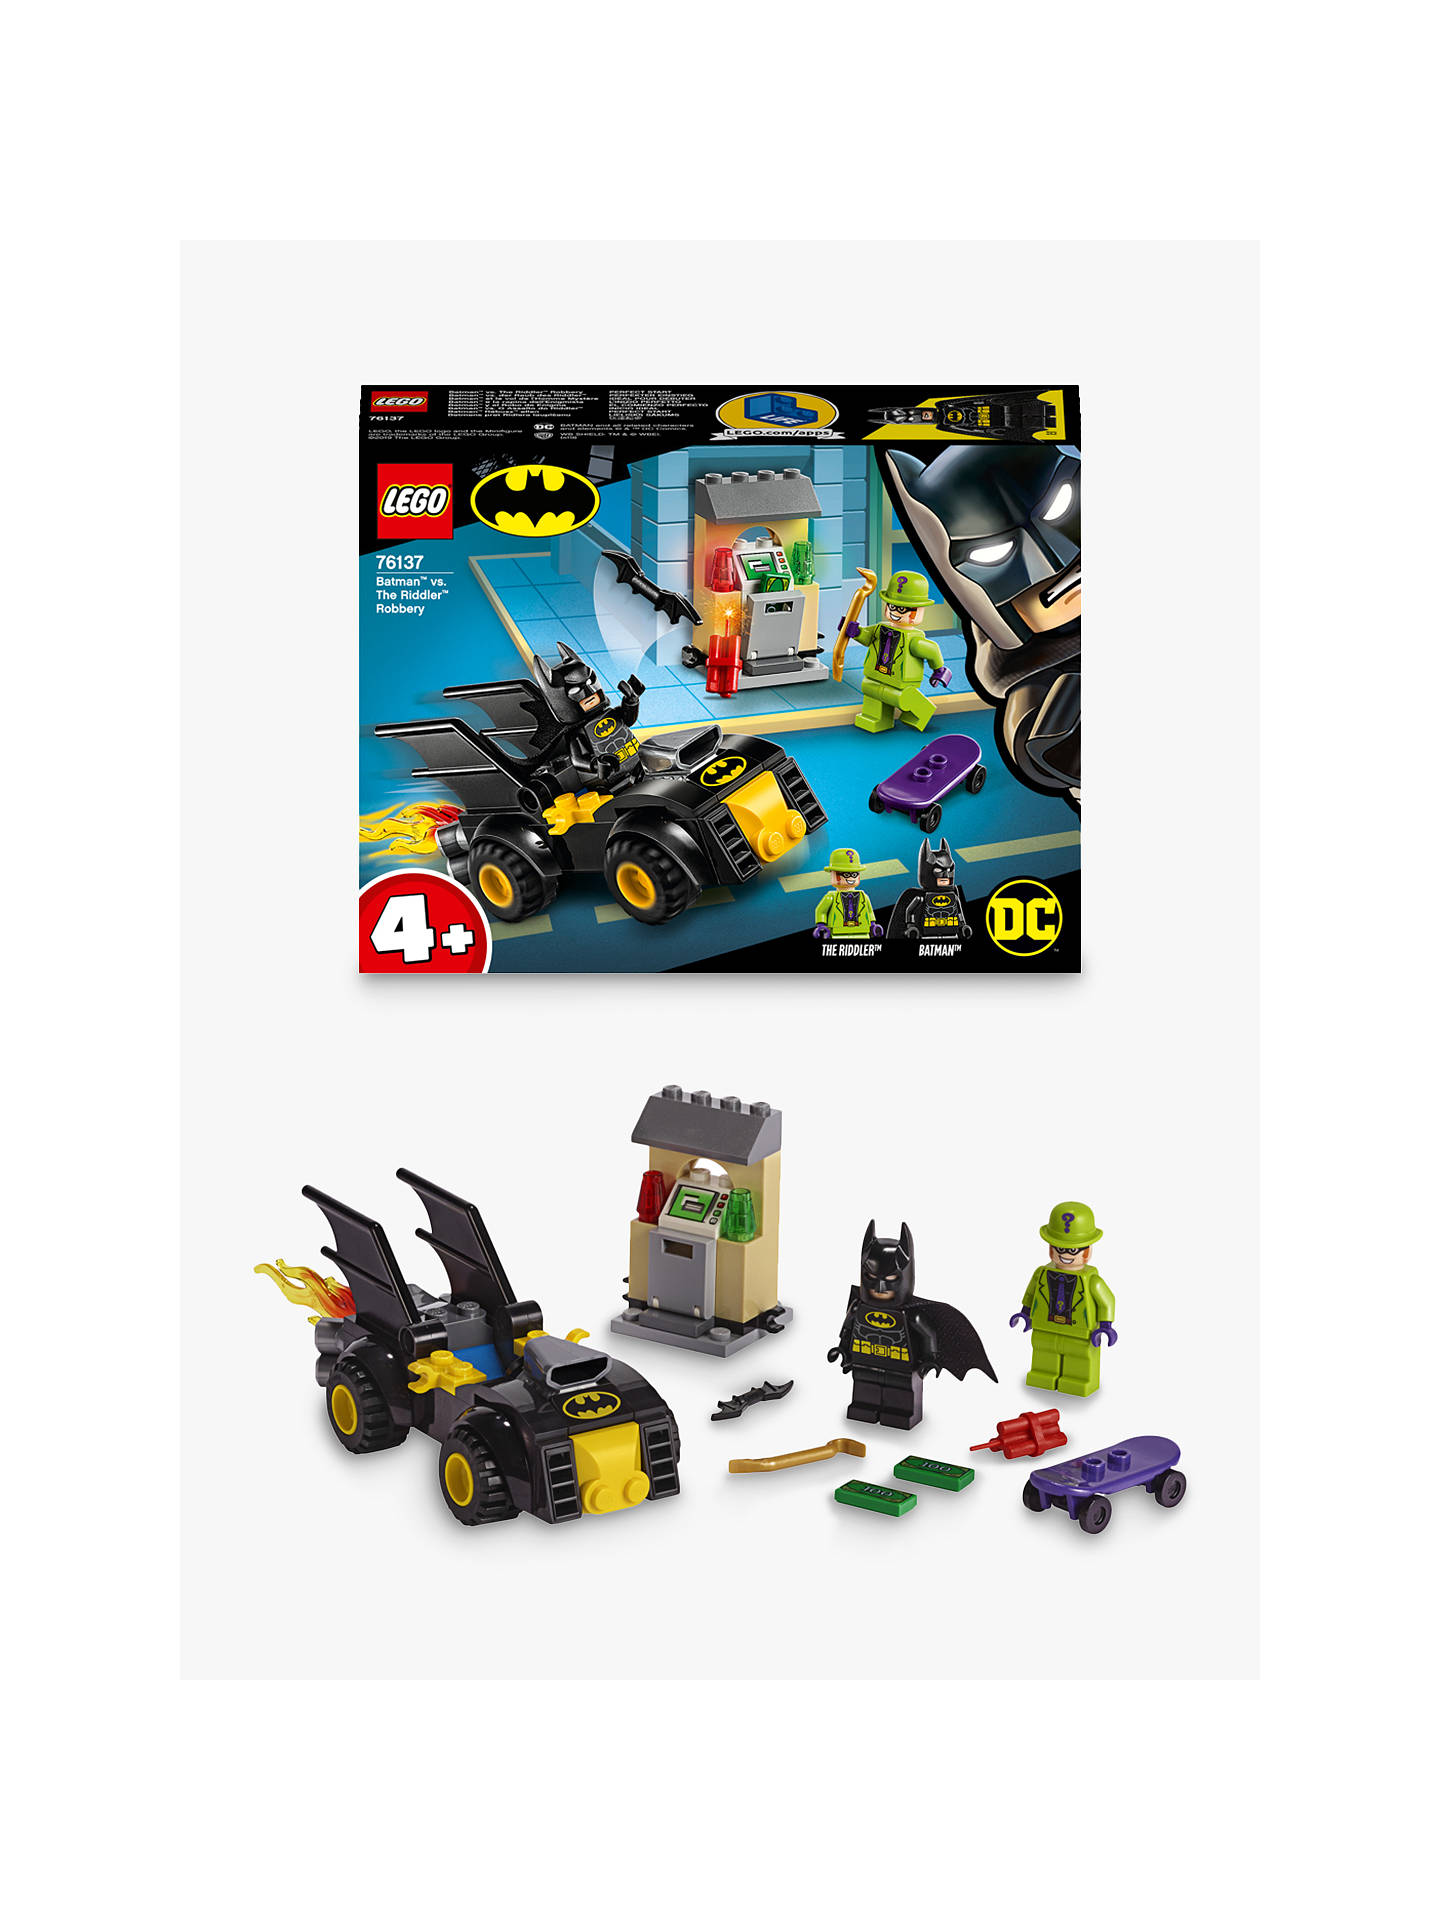 Swell Lego Dc Batman 76137 Batman Vs The Riddler Robbery With Batmobile Evergreenethics Interior Chair Design Evergreenethicsorg